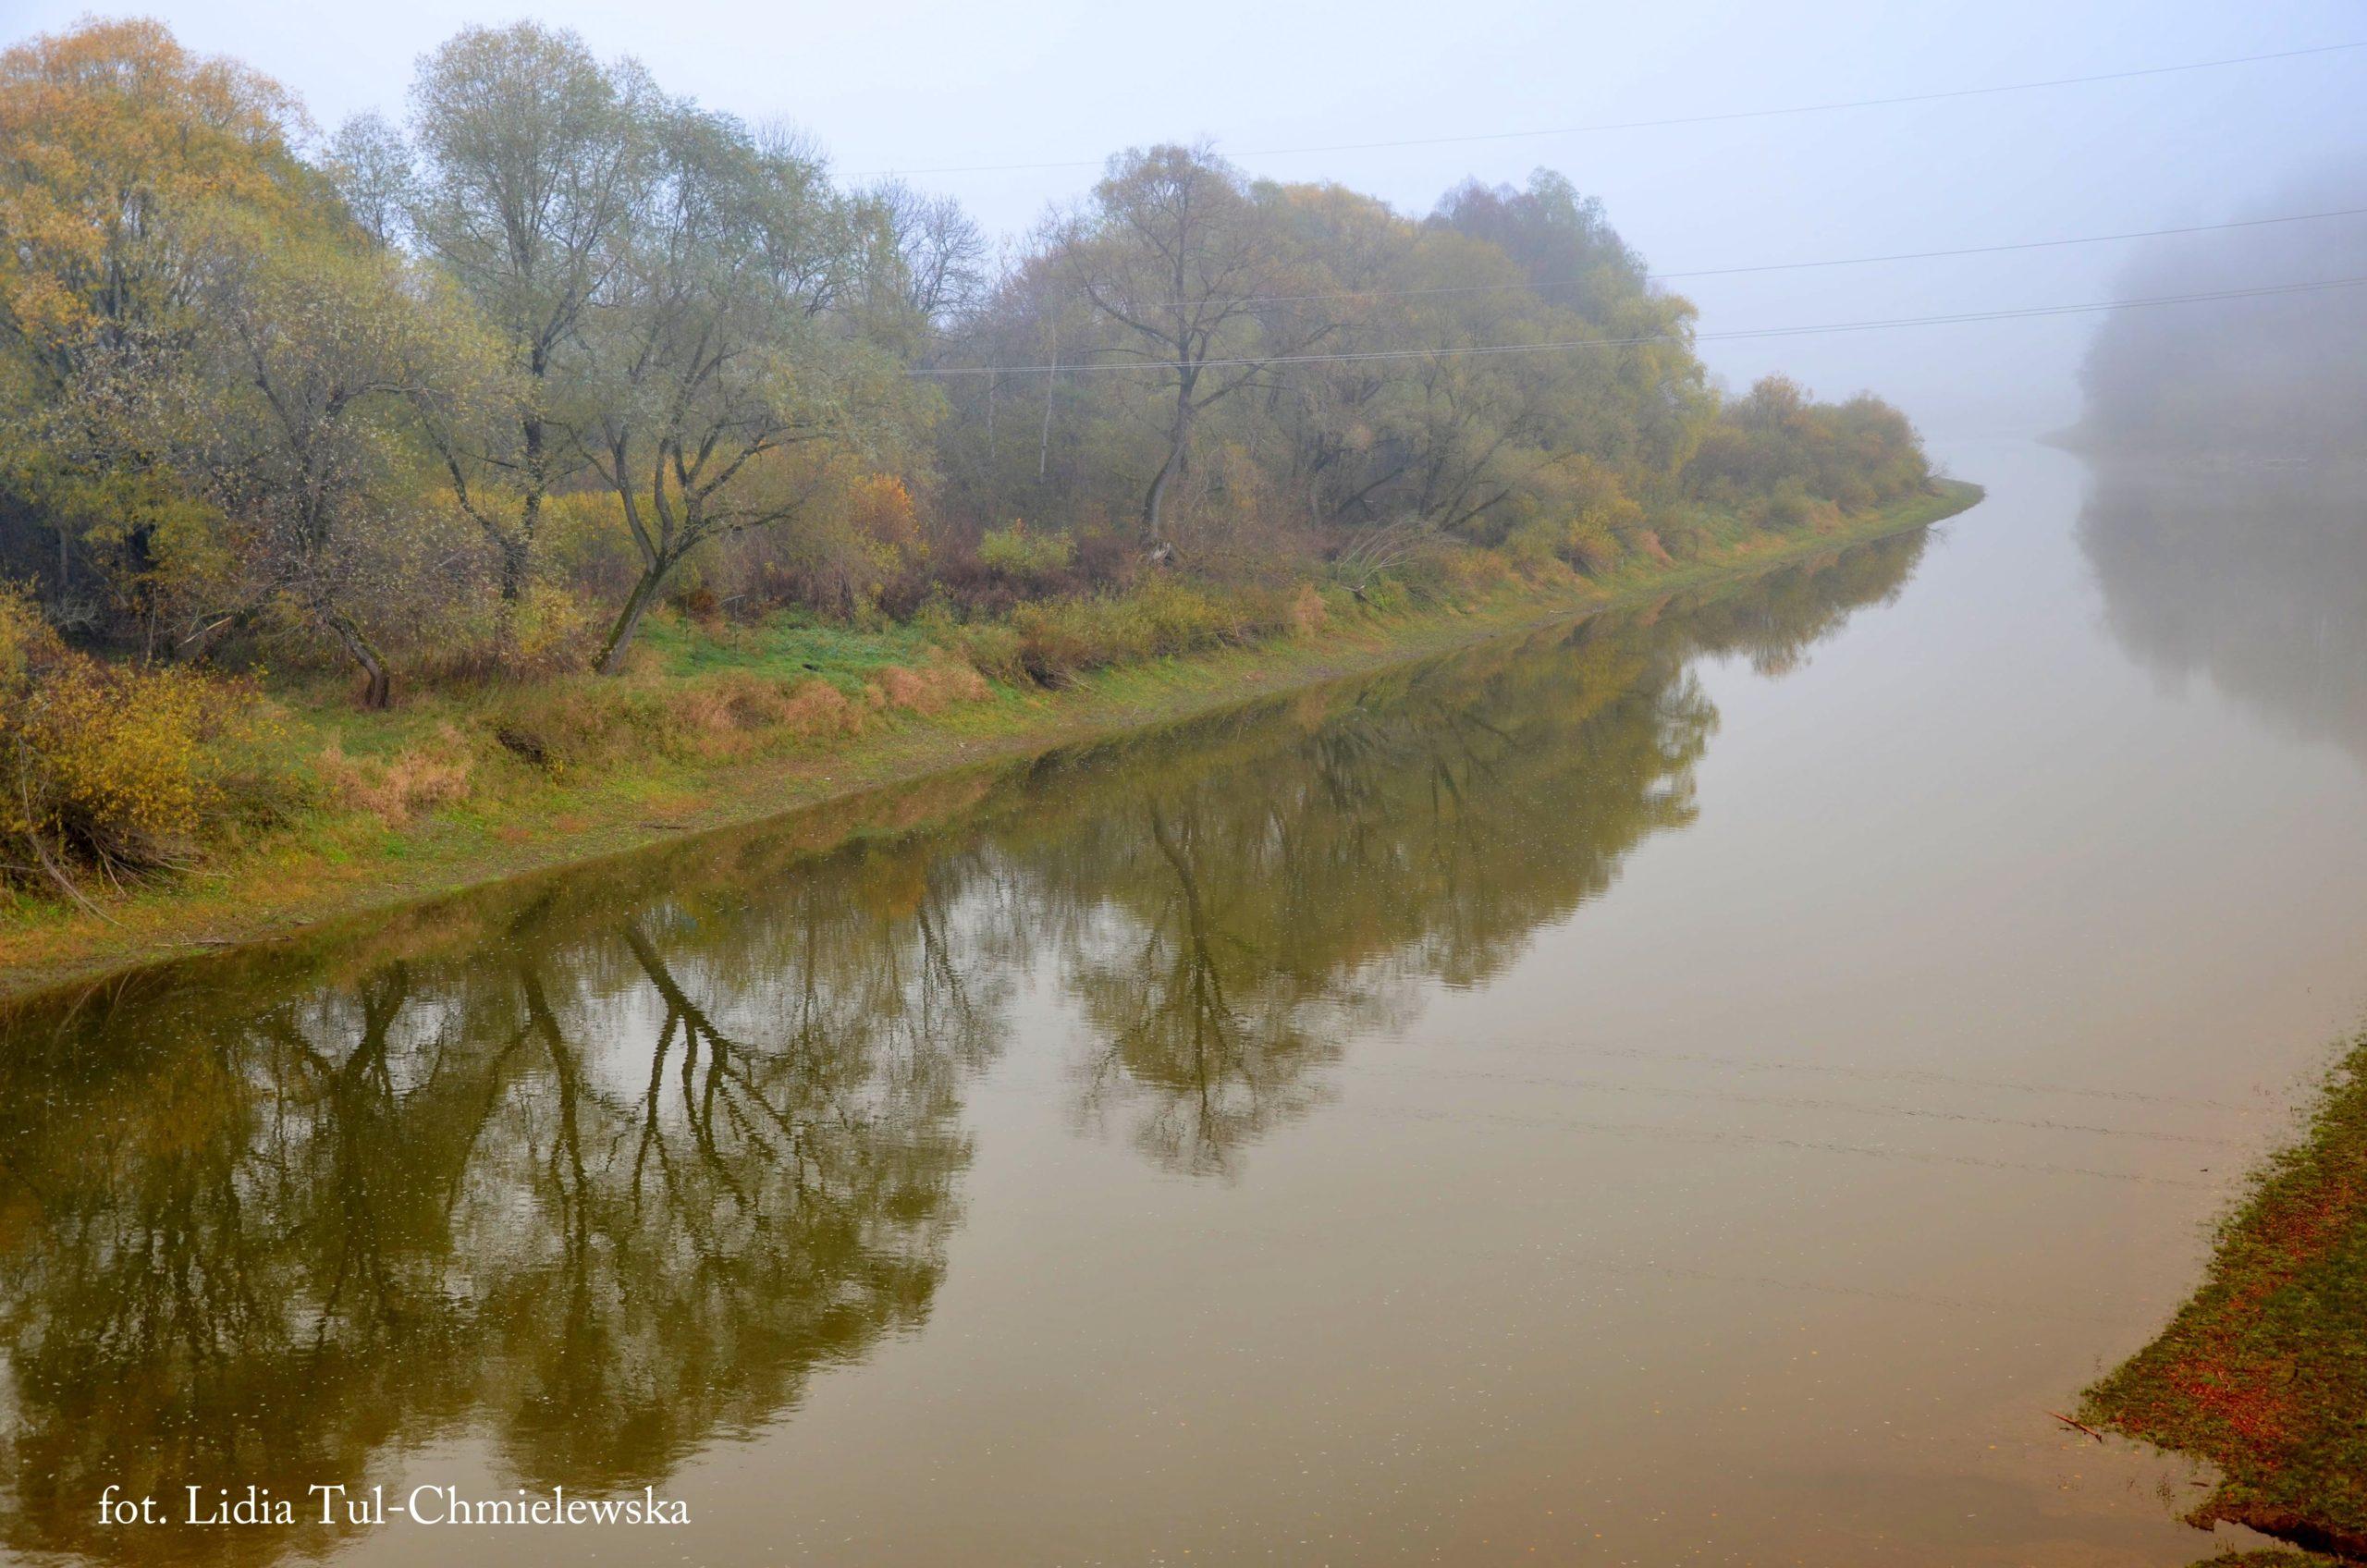 Listopadowy spokój fot. Lidia Tul-Chmielewska